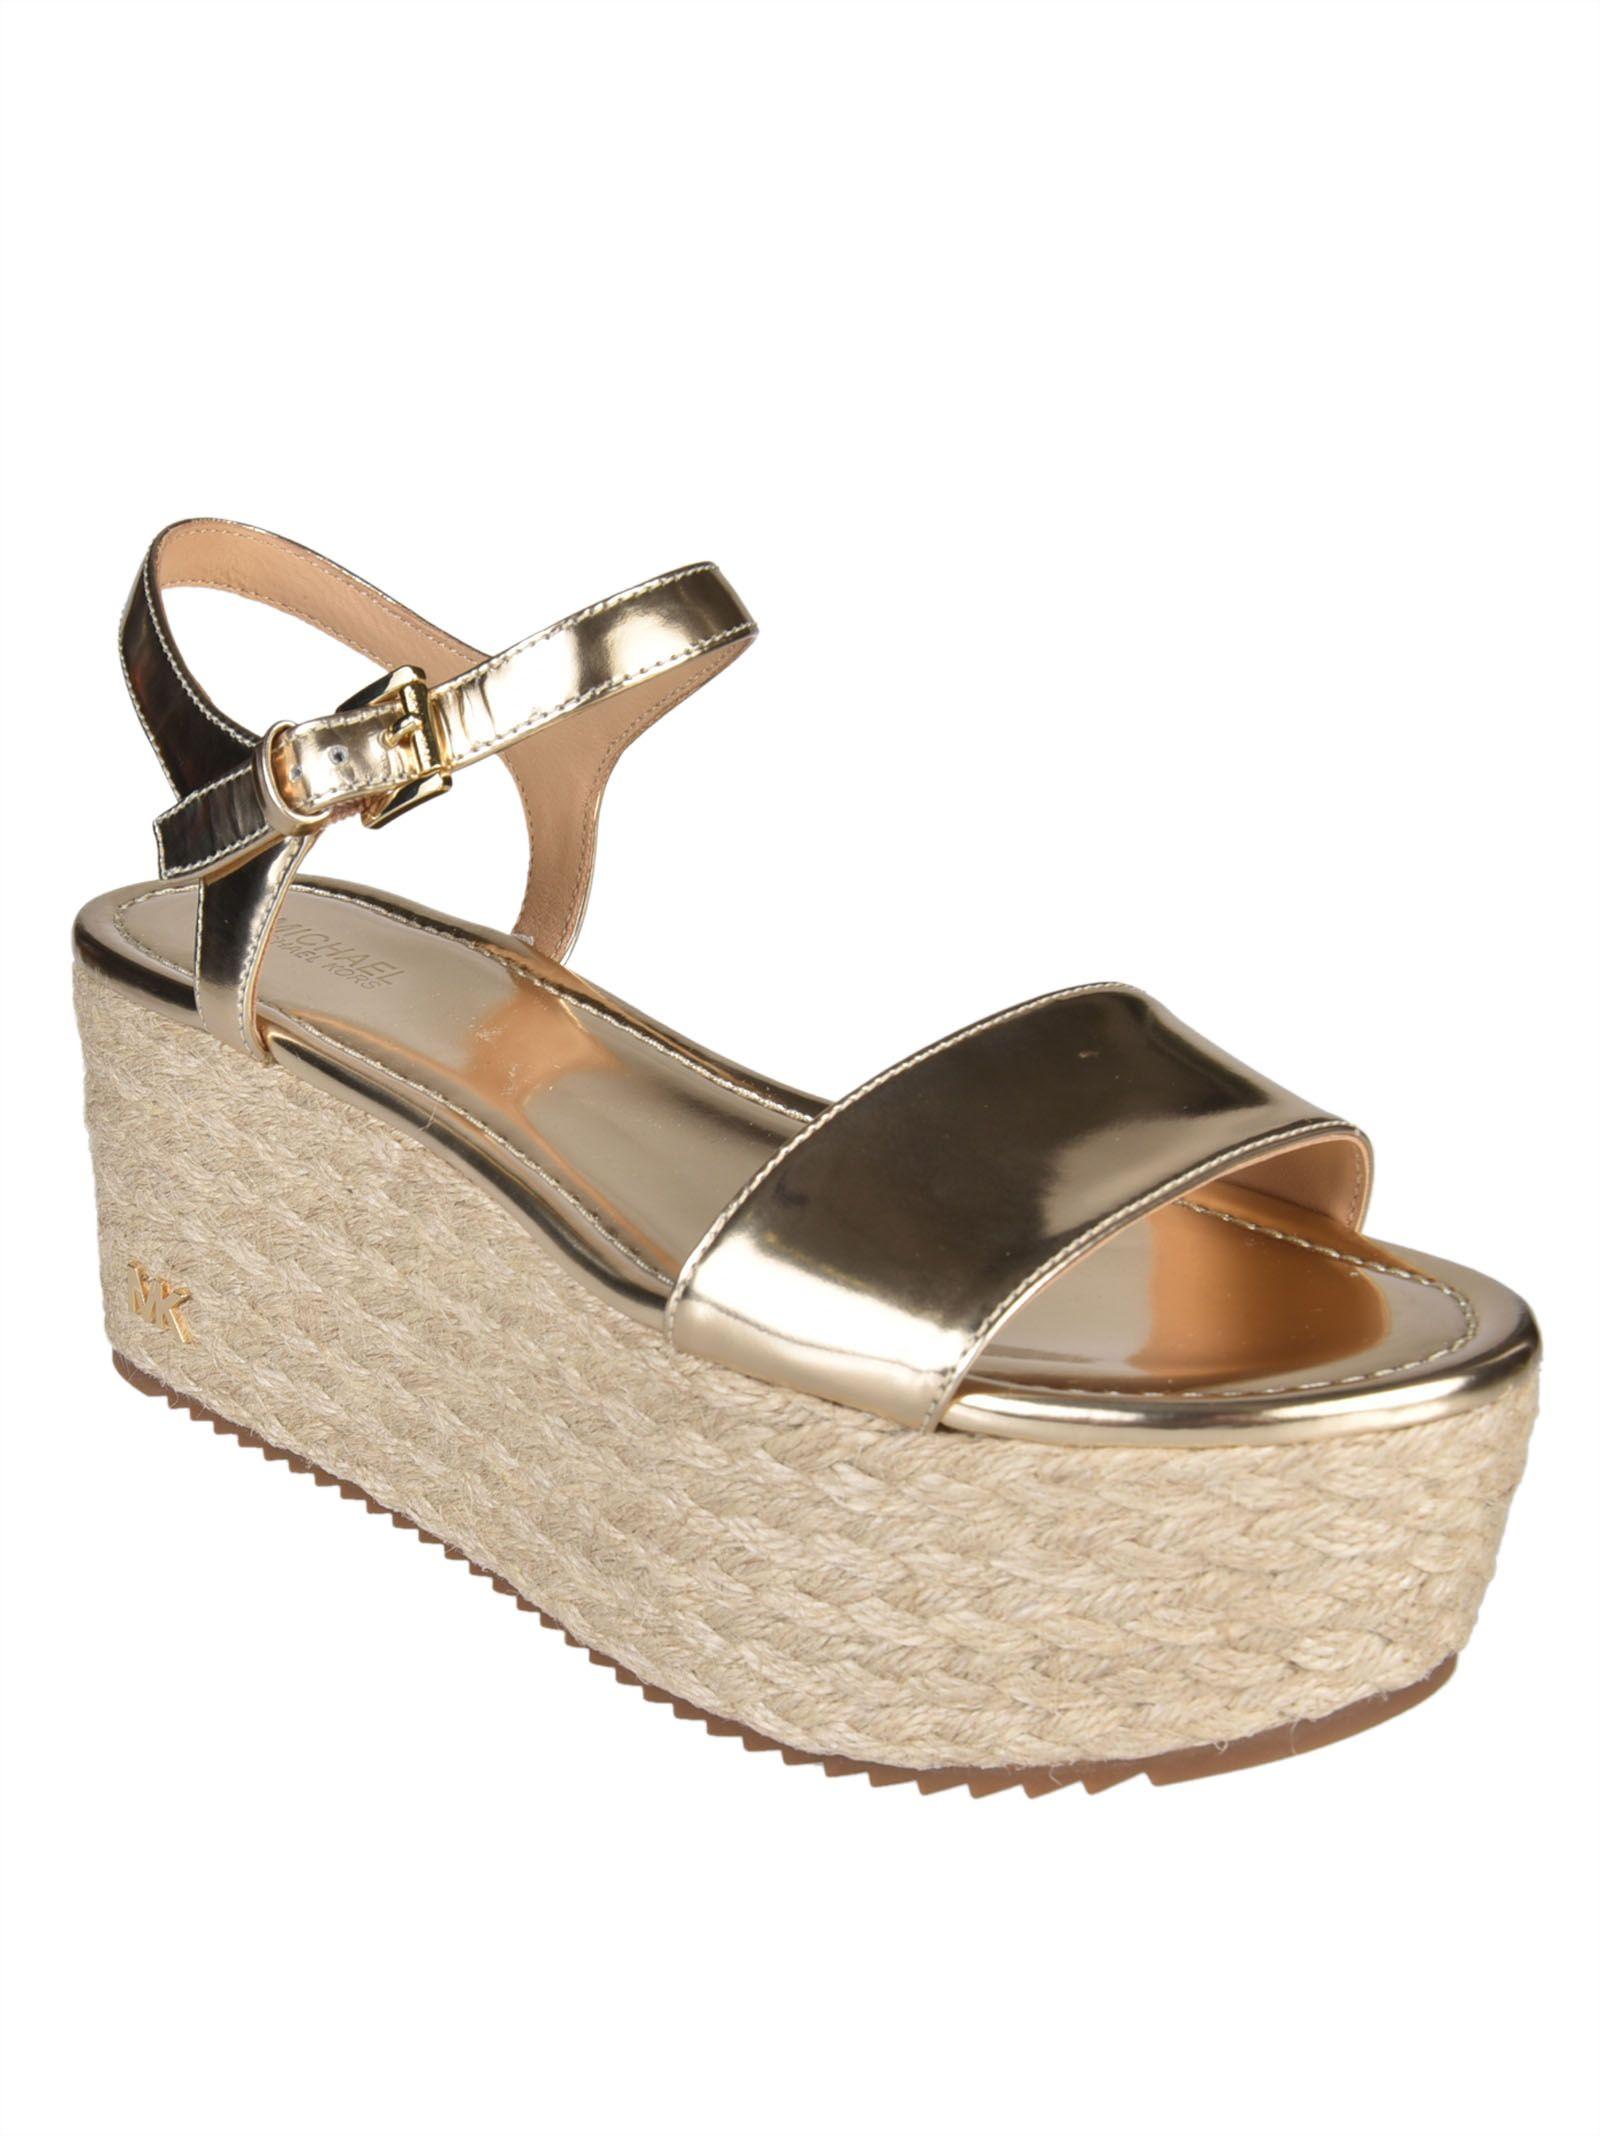 0688a611555 MICHAEL Michael Kors MICHAEL Michael Kors Nantucket Wedge Sandals ...